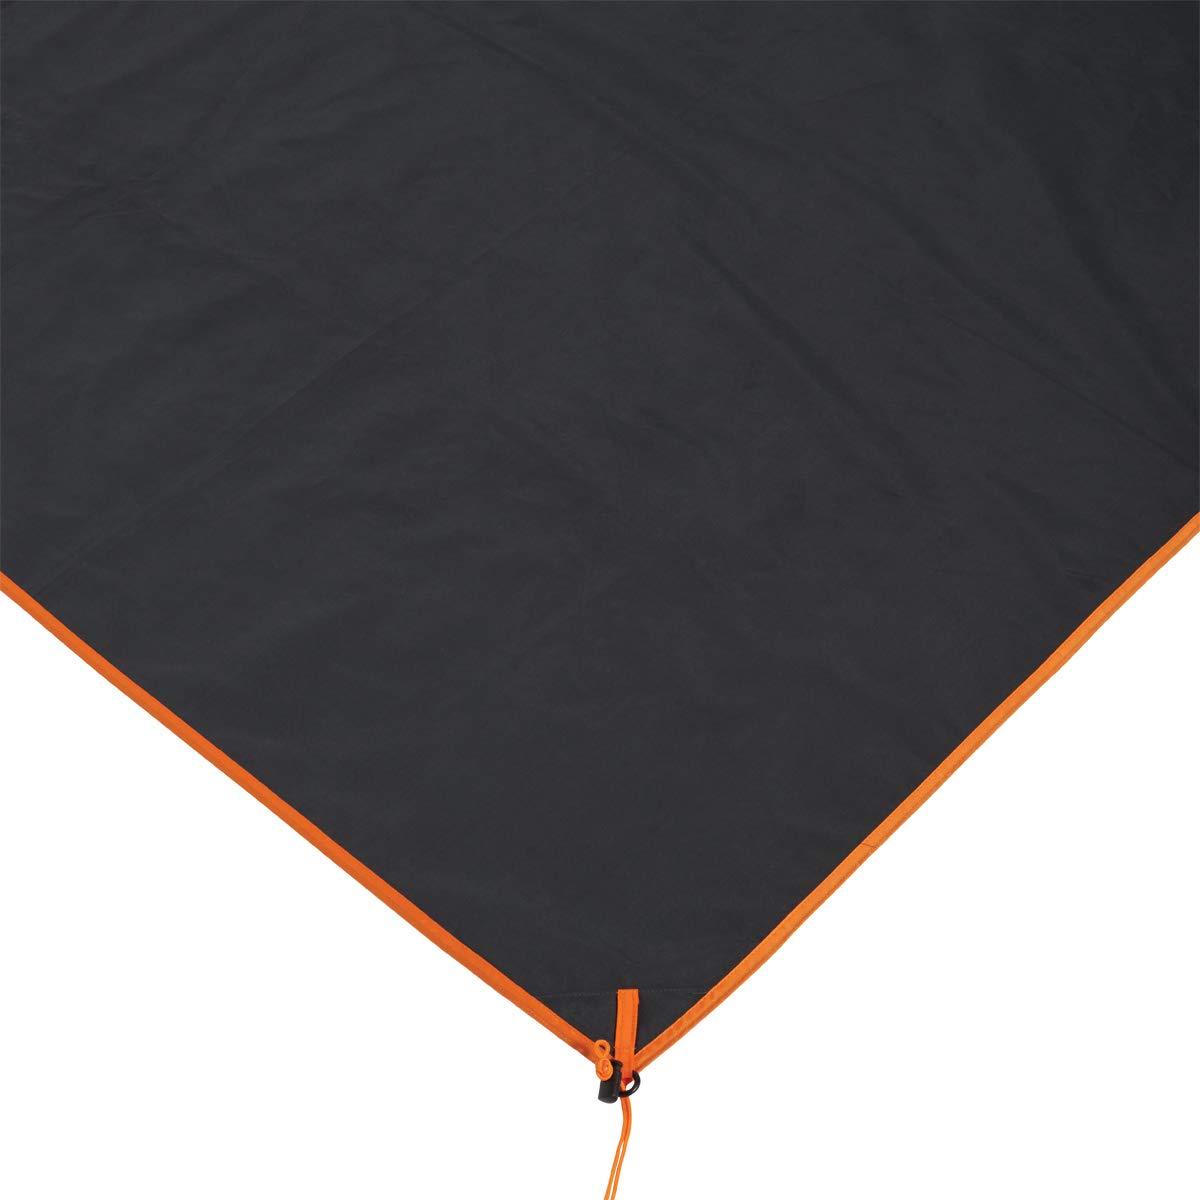 Eureka! Camp Comfort Add-On Tent Floor for Select Eureka! Tents